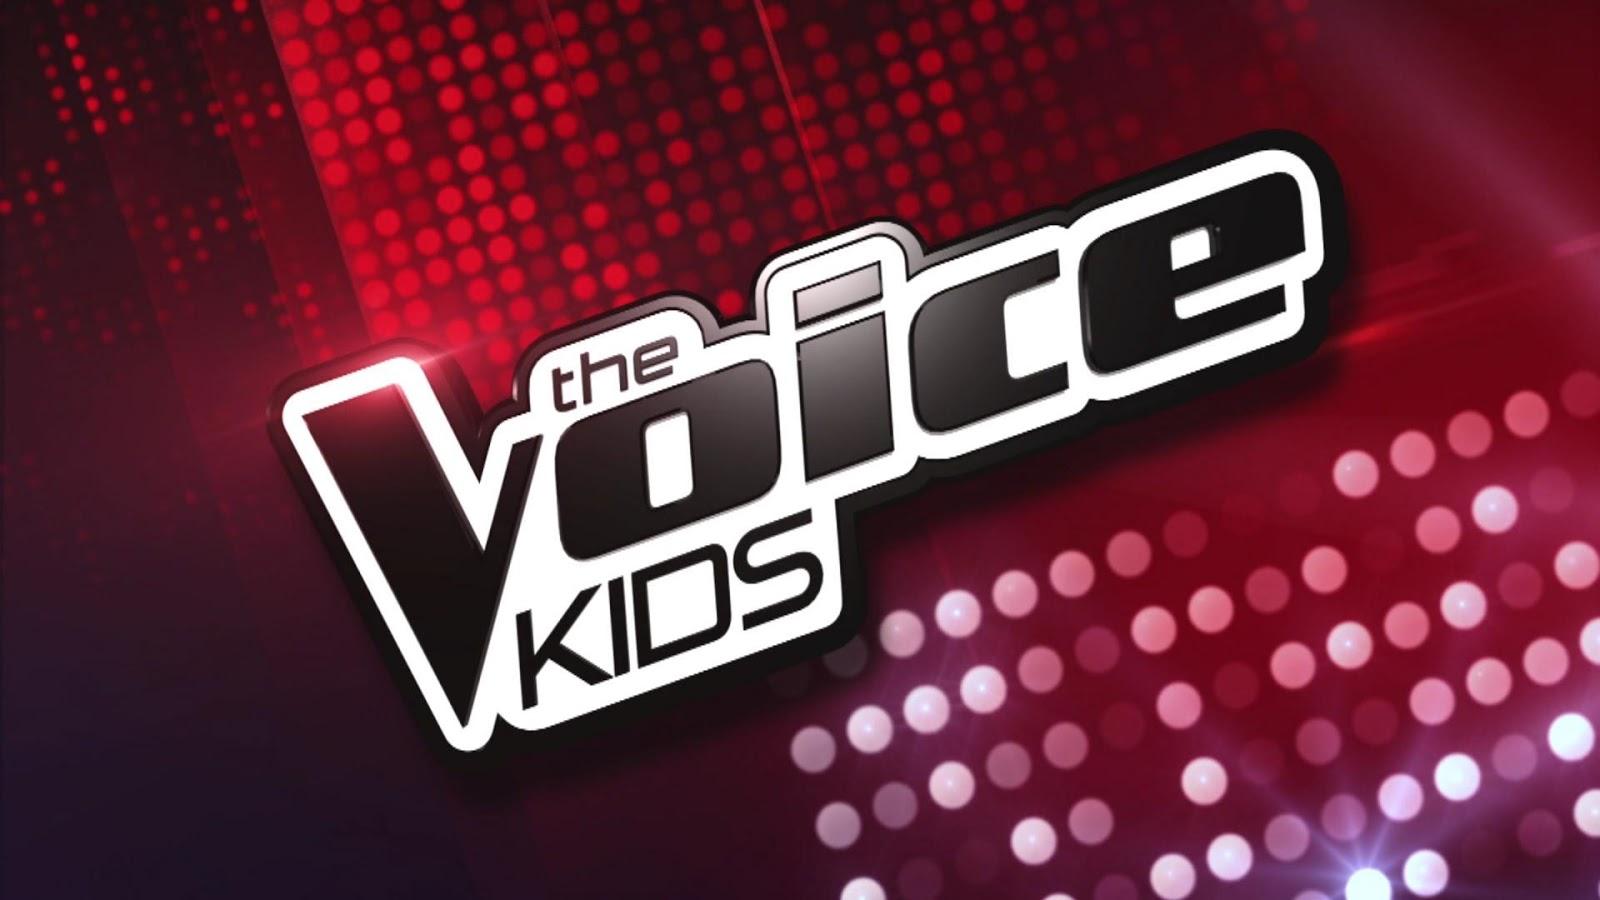 The voice kids show de talentos em estria jnt jundi noticias stopboris Image collections